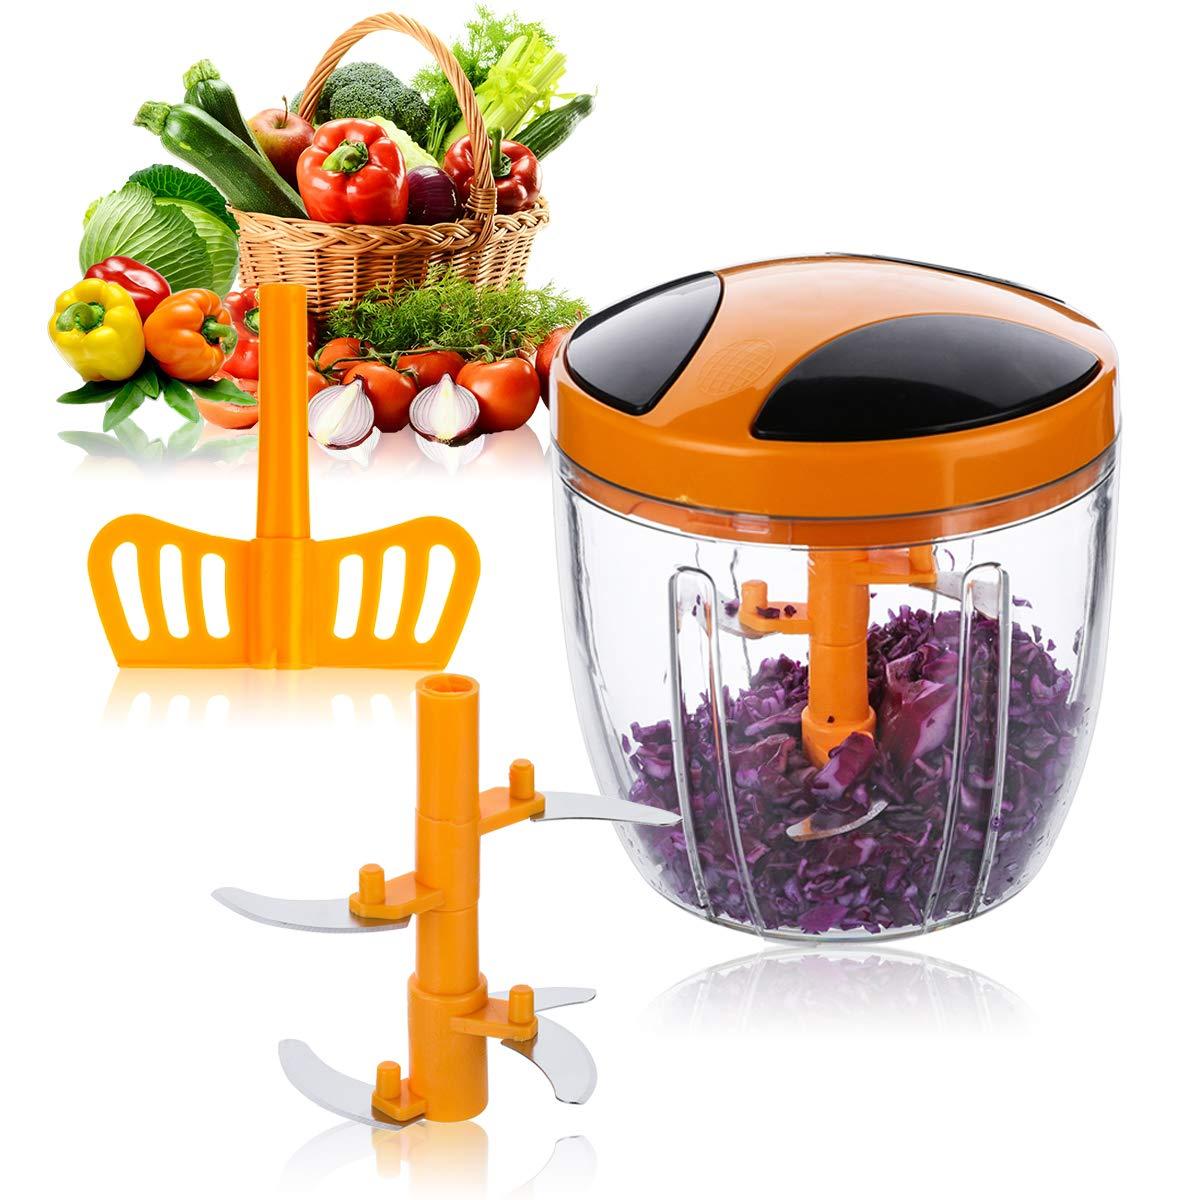 Haipei 900 ml FoodChoppers Kitchen Essential Vegetable Processor Chopper Orange Multifunction Manual Food Chopper, Pull String Blender with 5 Sharp Stainless Steel Blades Groopmoon